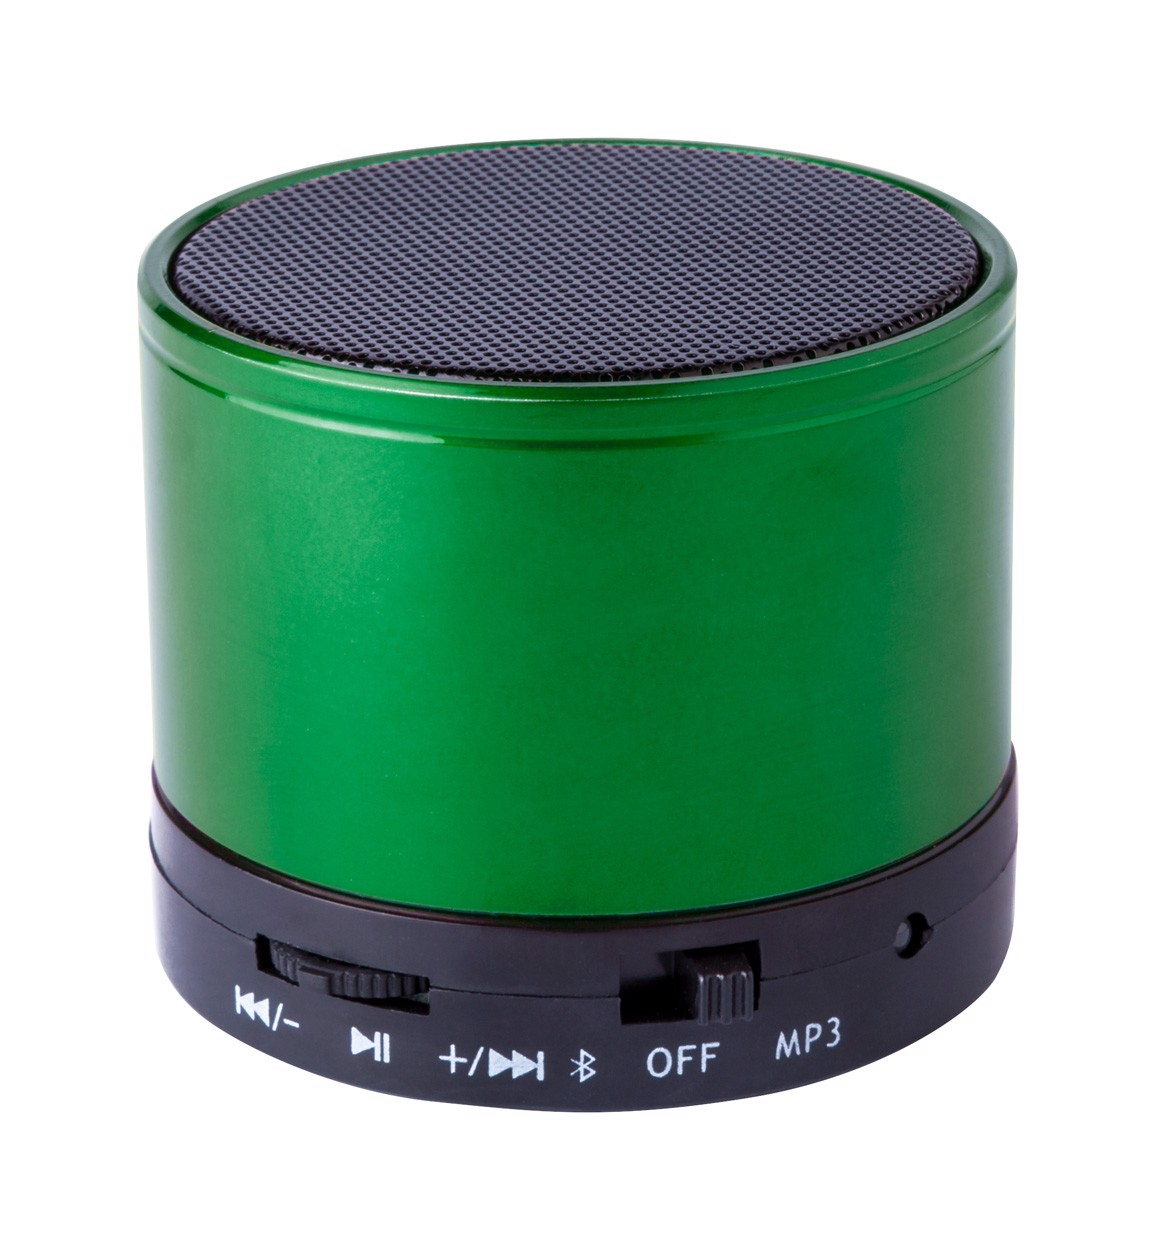 Bluetooth Speaker Martins - Green / Black